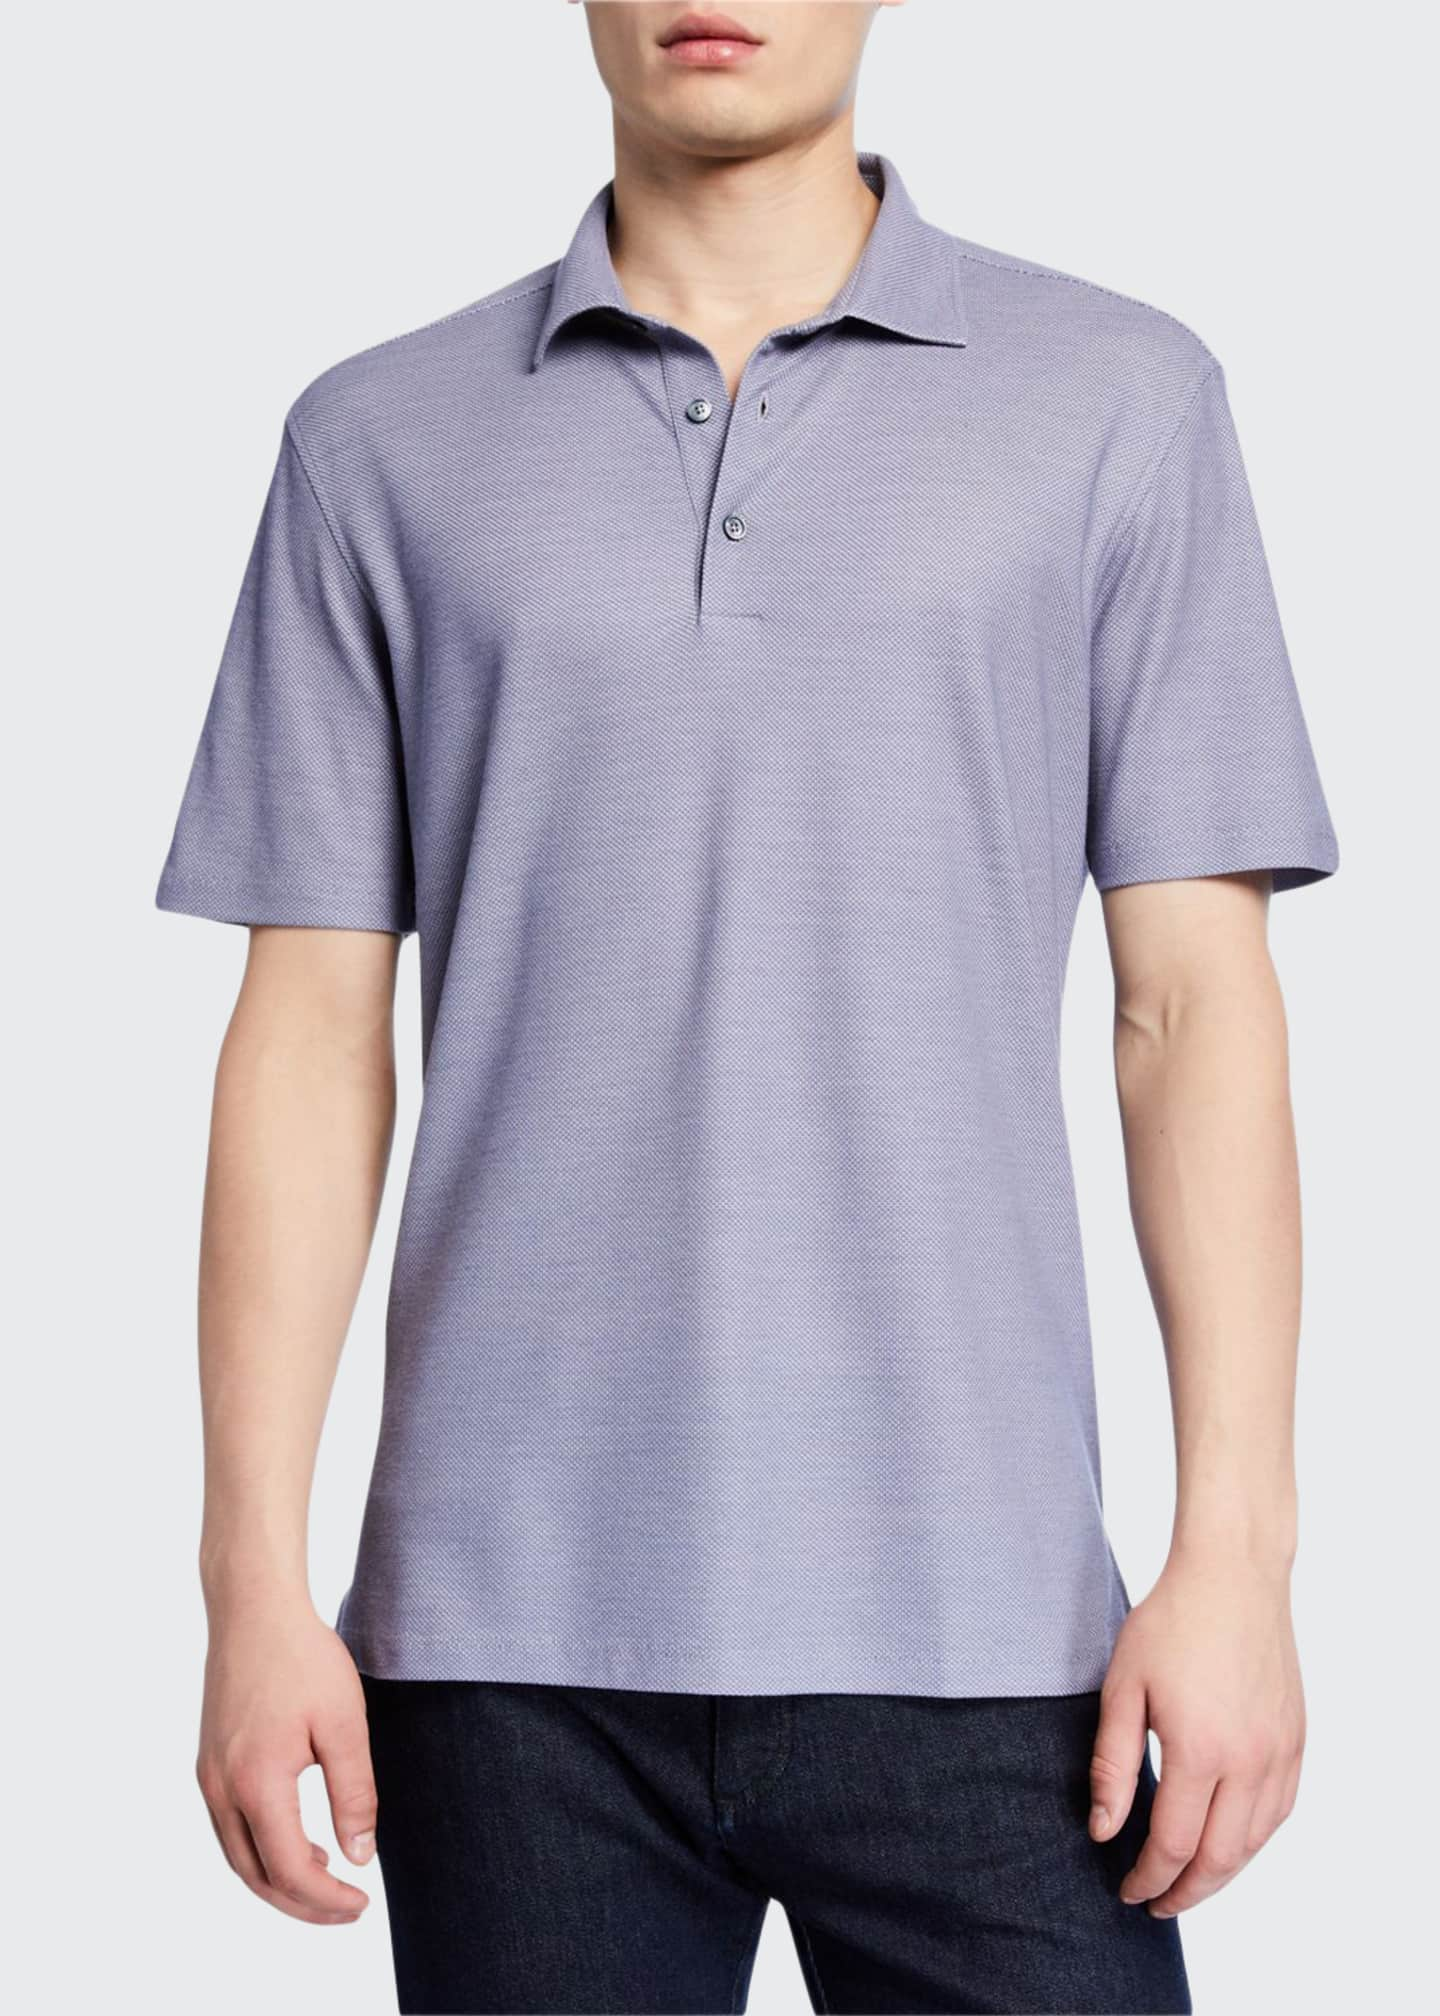 Ermenegildo Zegna Men's Birdseye-Knit Polo Shirt